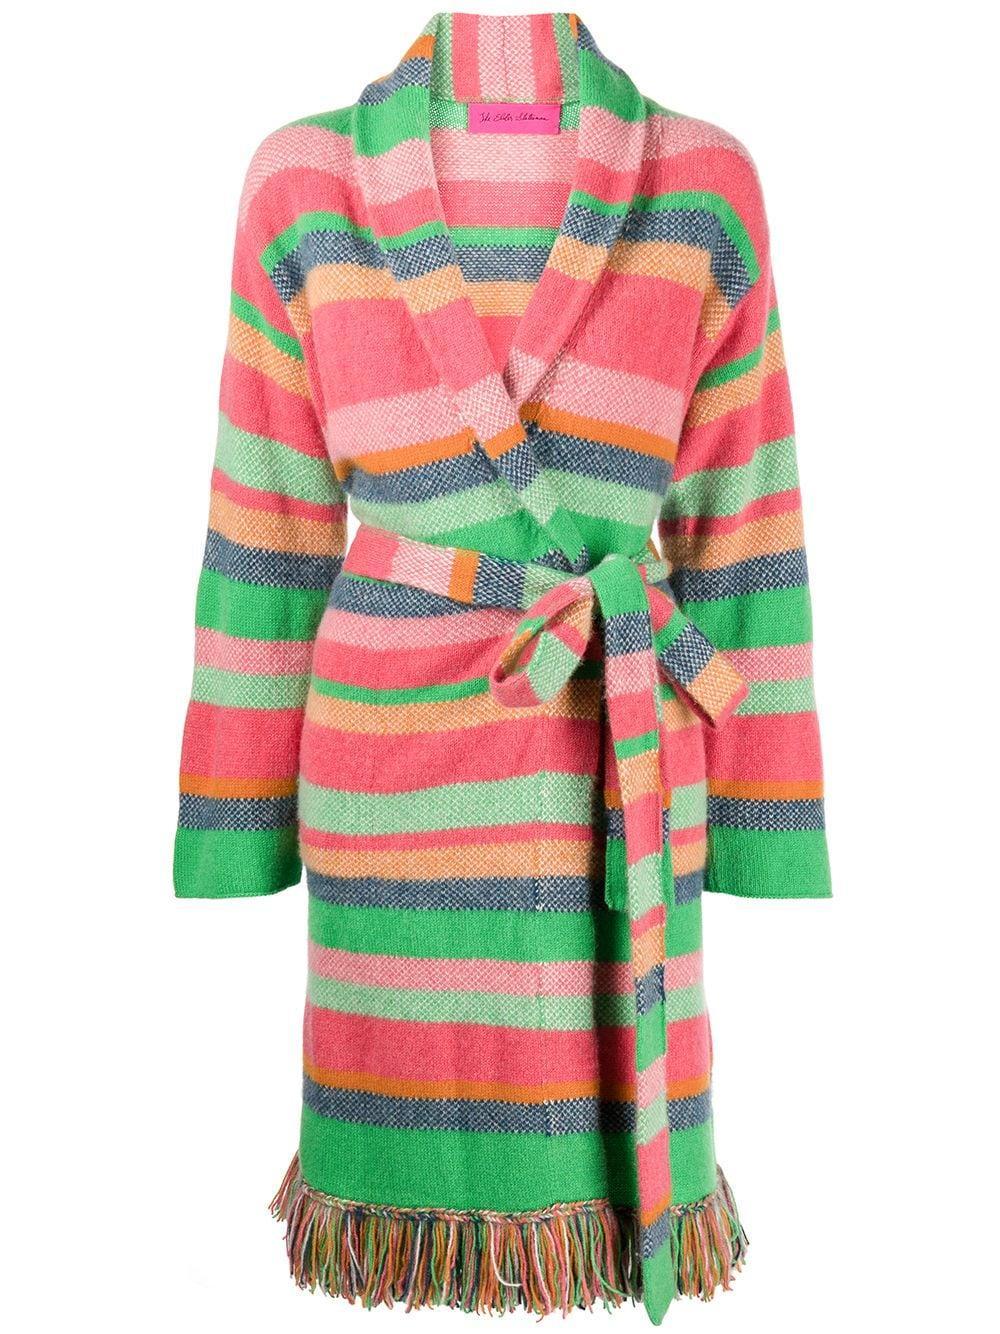 Pace Stripe Fringe Coat Item # 210311